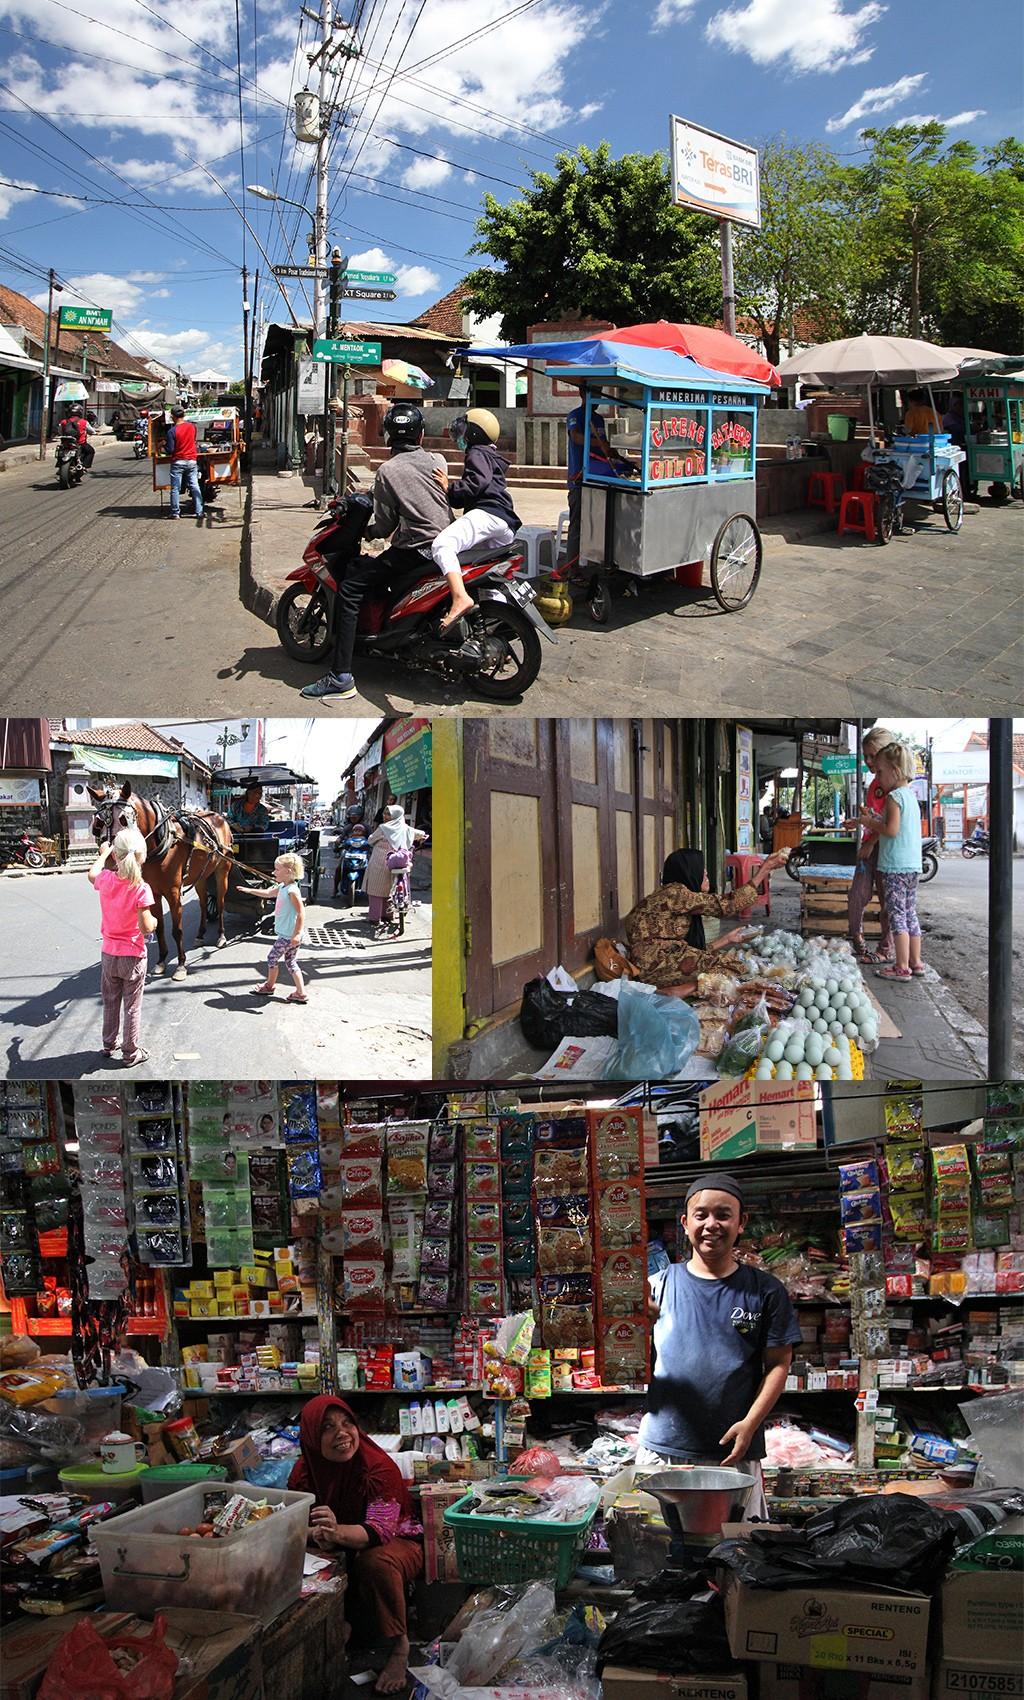 gezelligheid rond Pasar Kota Gede